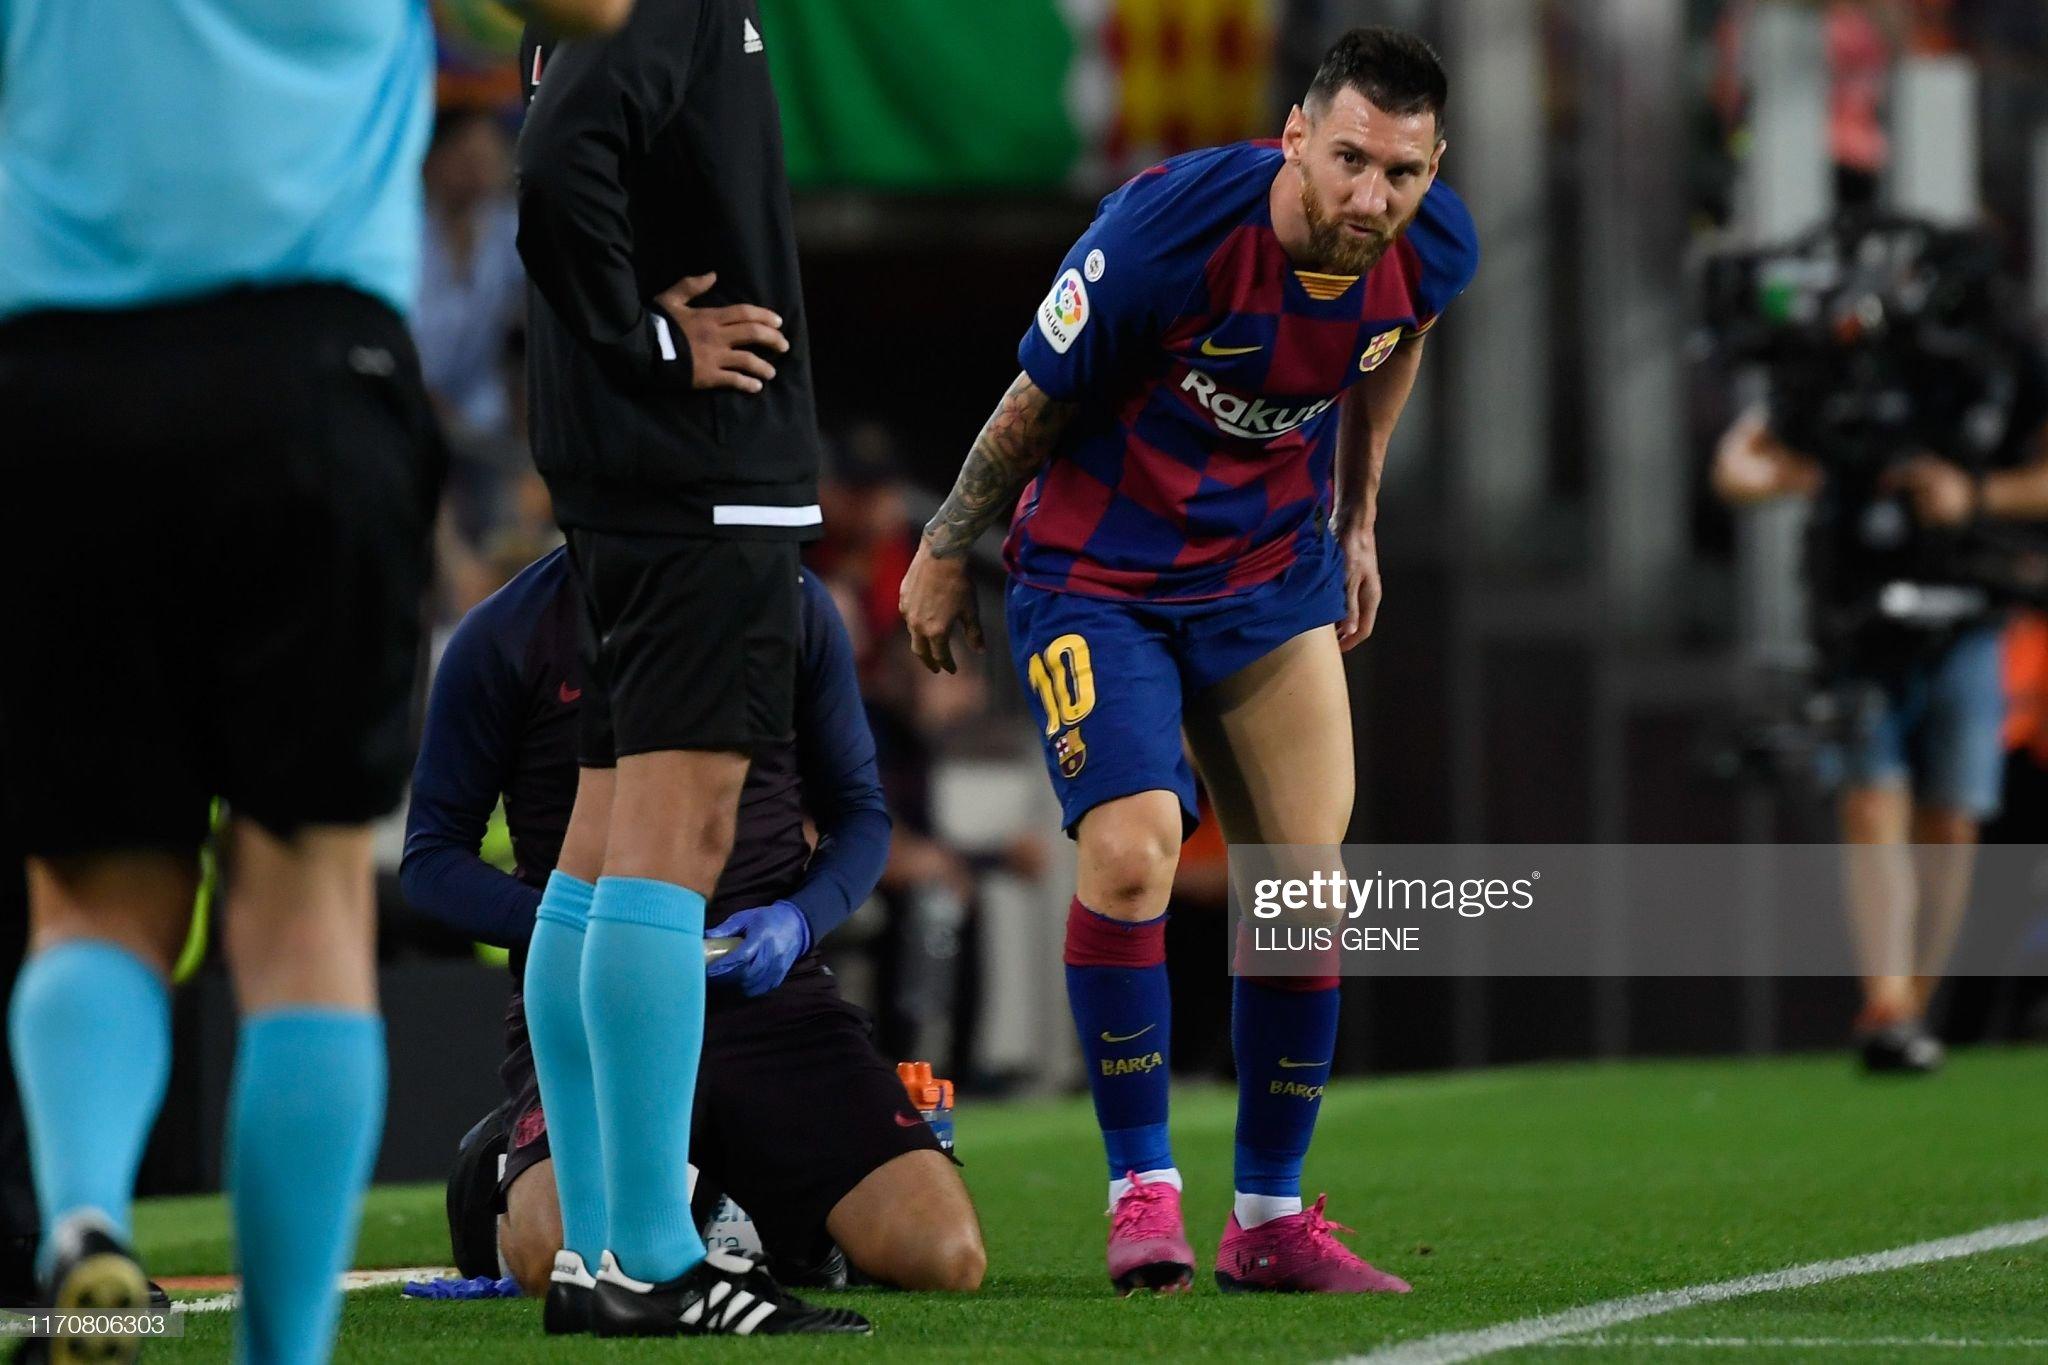 صور مباراة : برشلونة - فياريال 2-1 ( 24-09-2019 )  Barcelonas-argentine-forward-lionel-messi-reacts-after-being-treated-picture-id1170806303?s=2048x2048